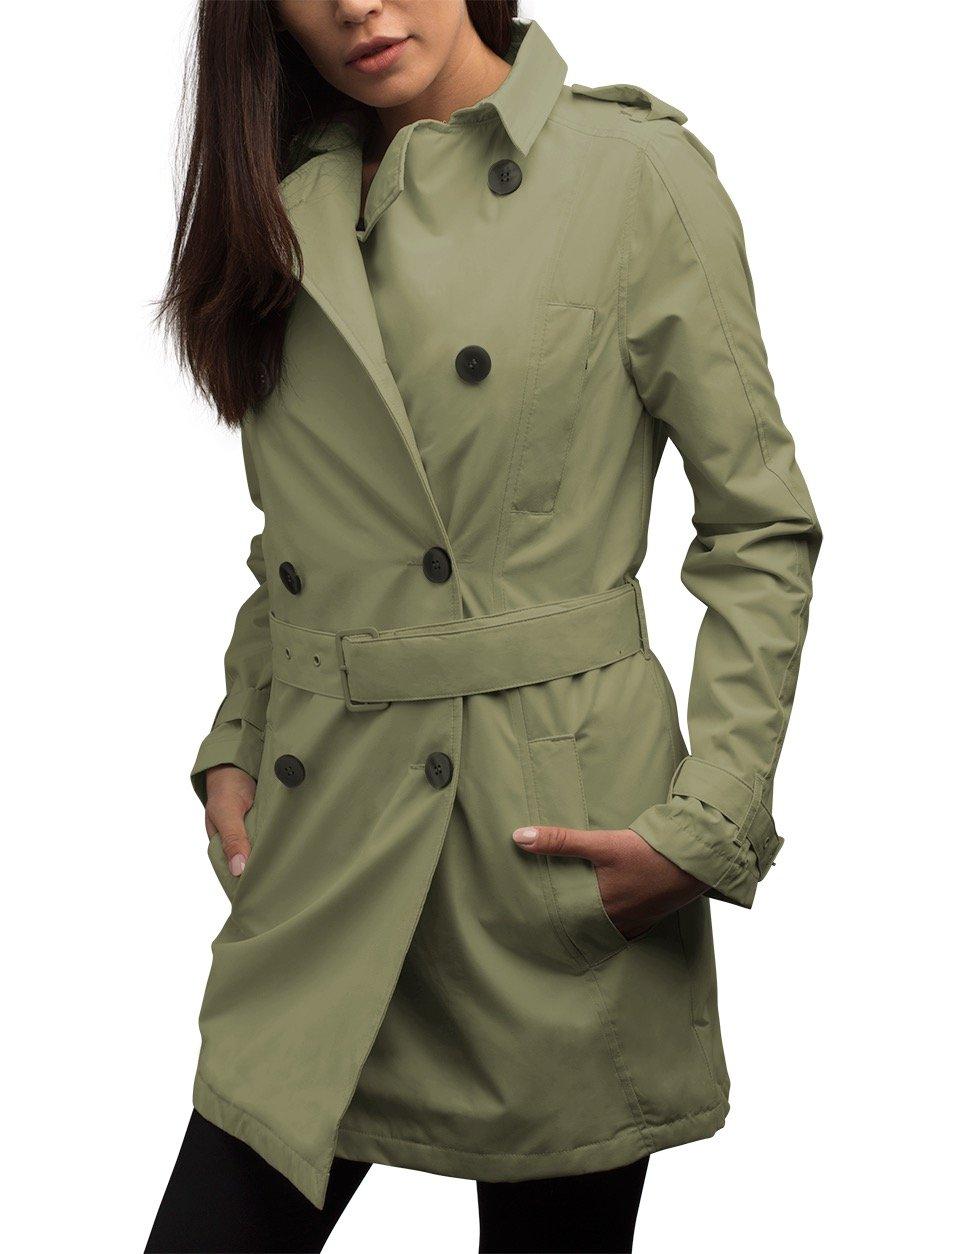 SCOTTeVEST Women's Trench Coat - 18 Pockets - Travel Clothing TYM L by SCOTTeVEST (Image #1)